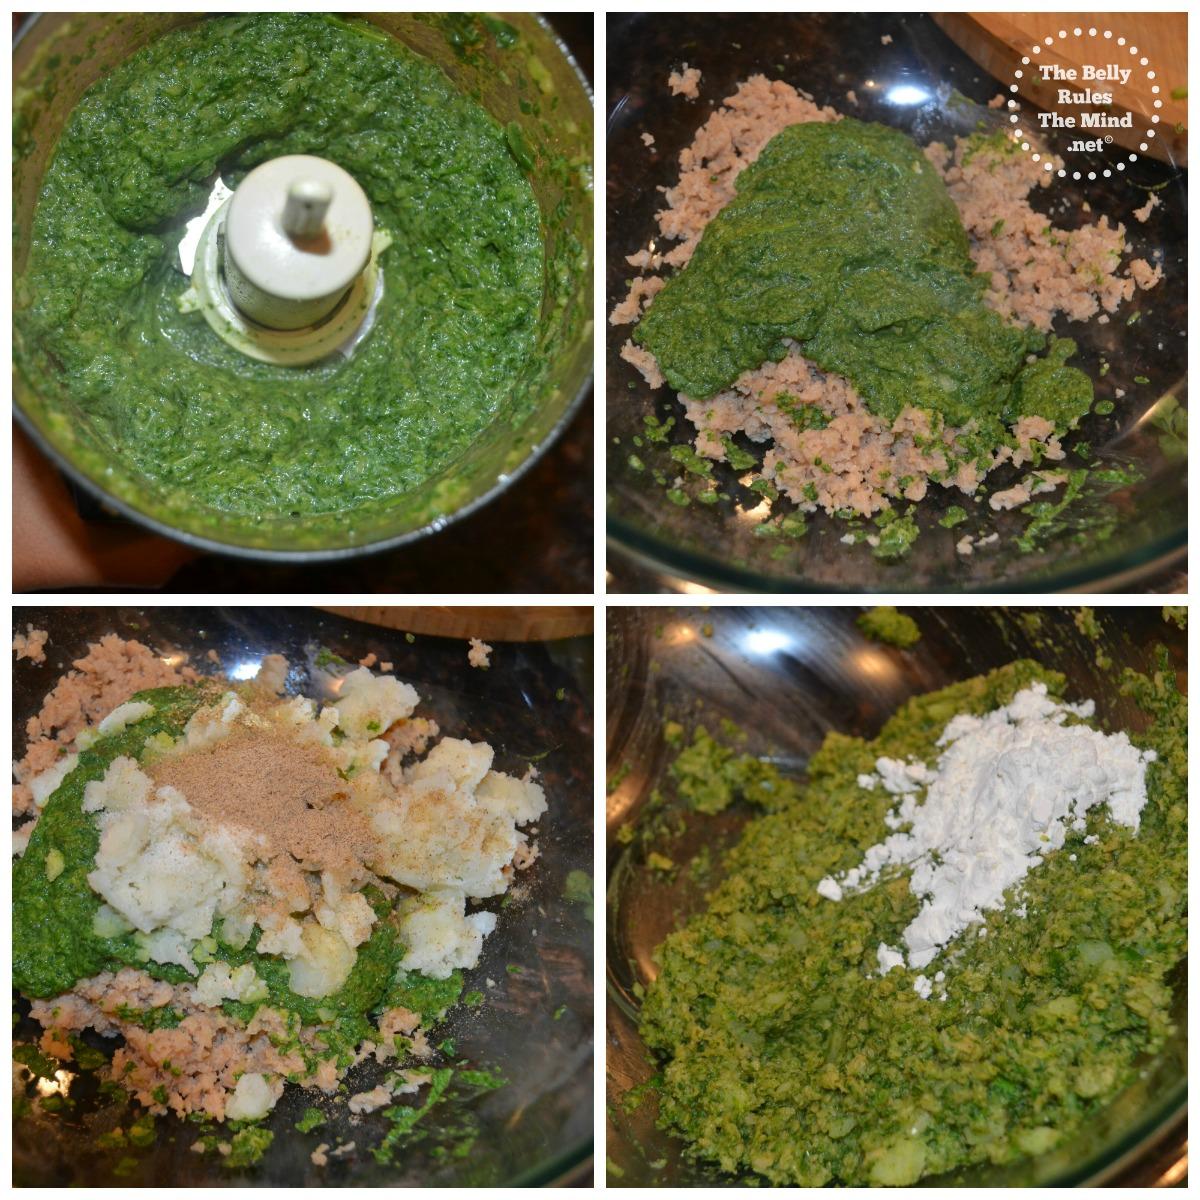 garlicky spinach soya patties